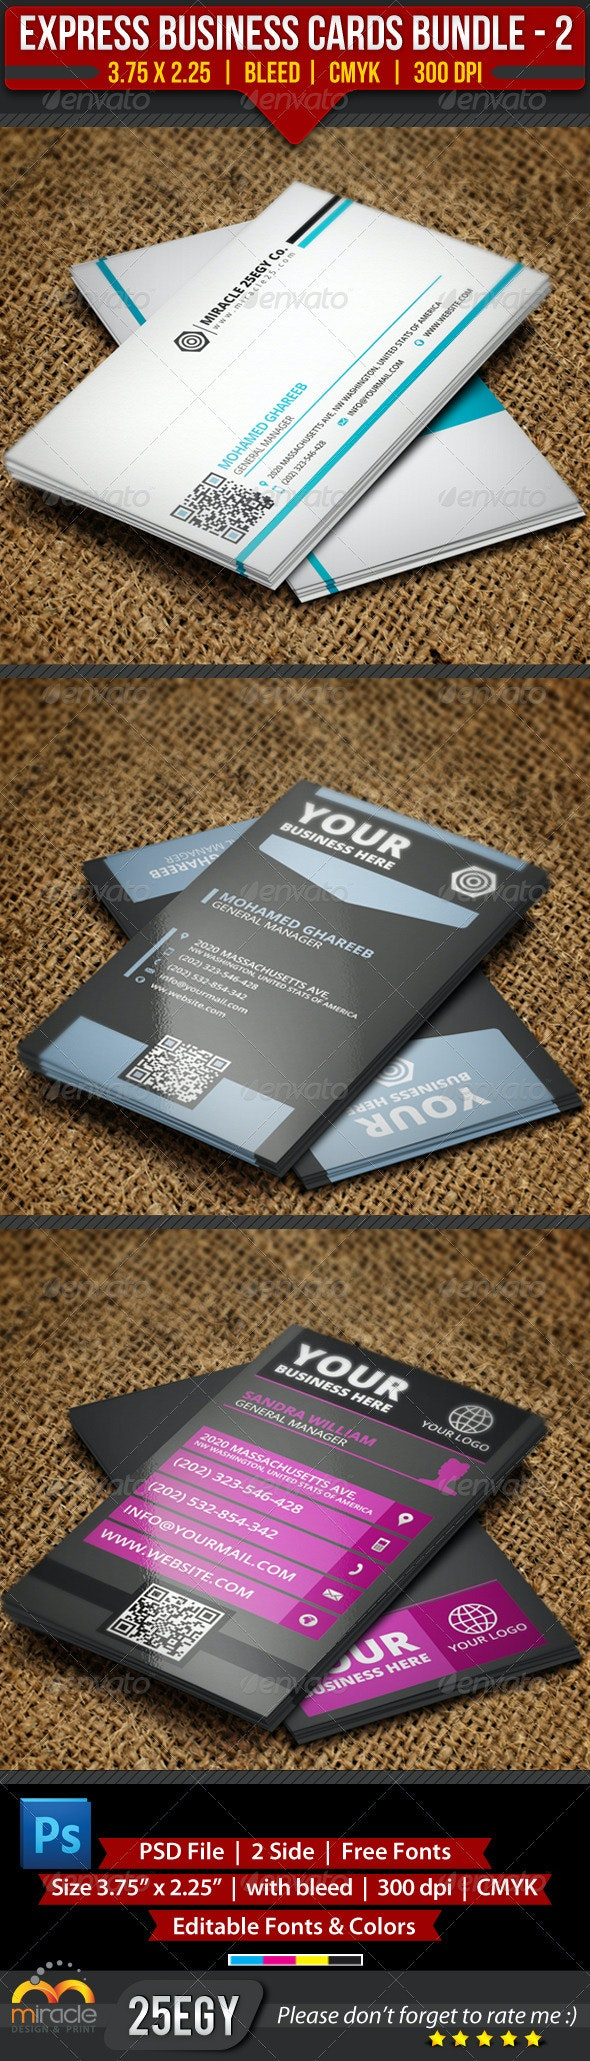 Express Business Cards Bundle #2 - Creative Business Cards